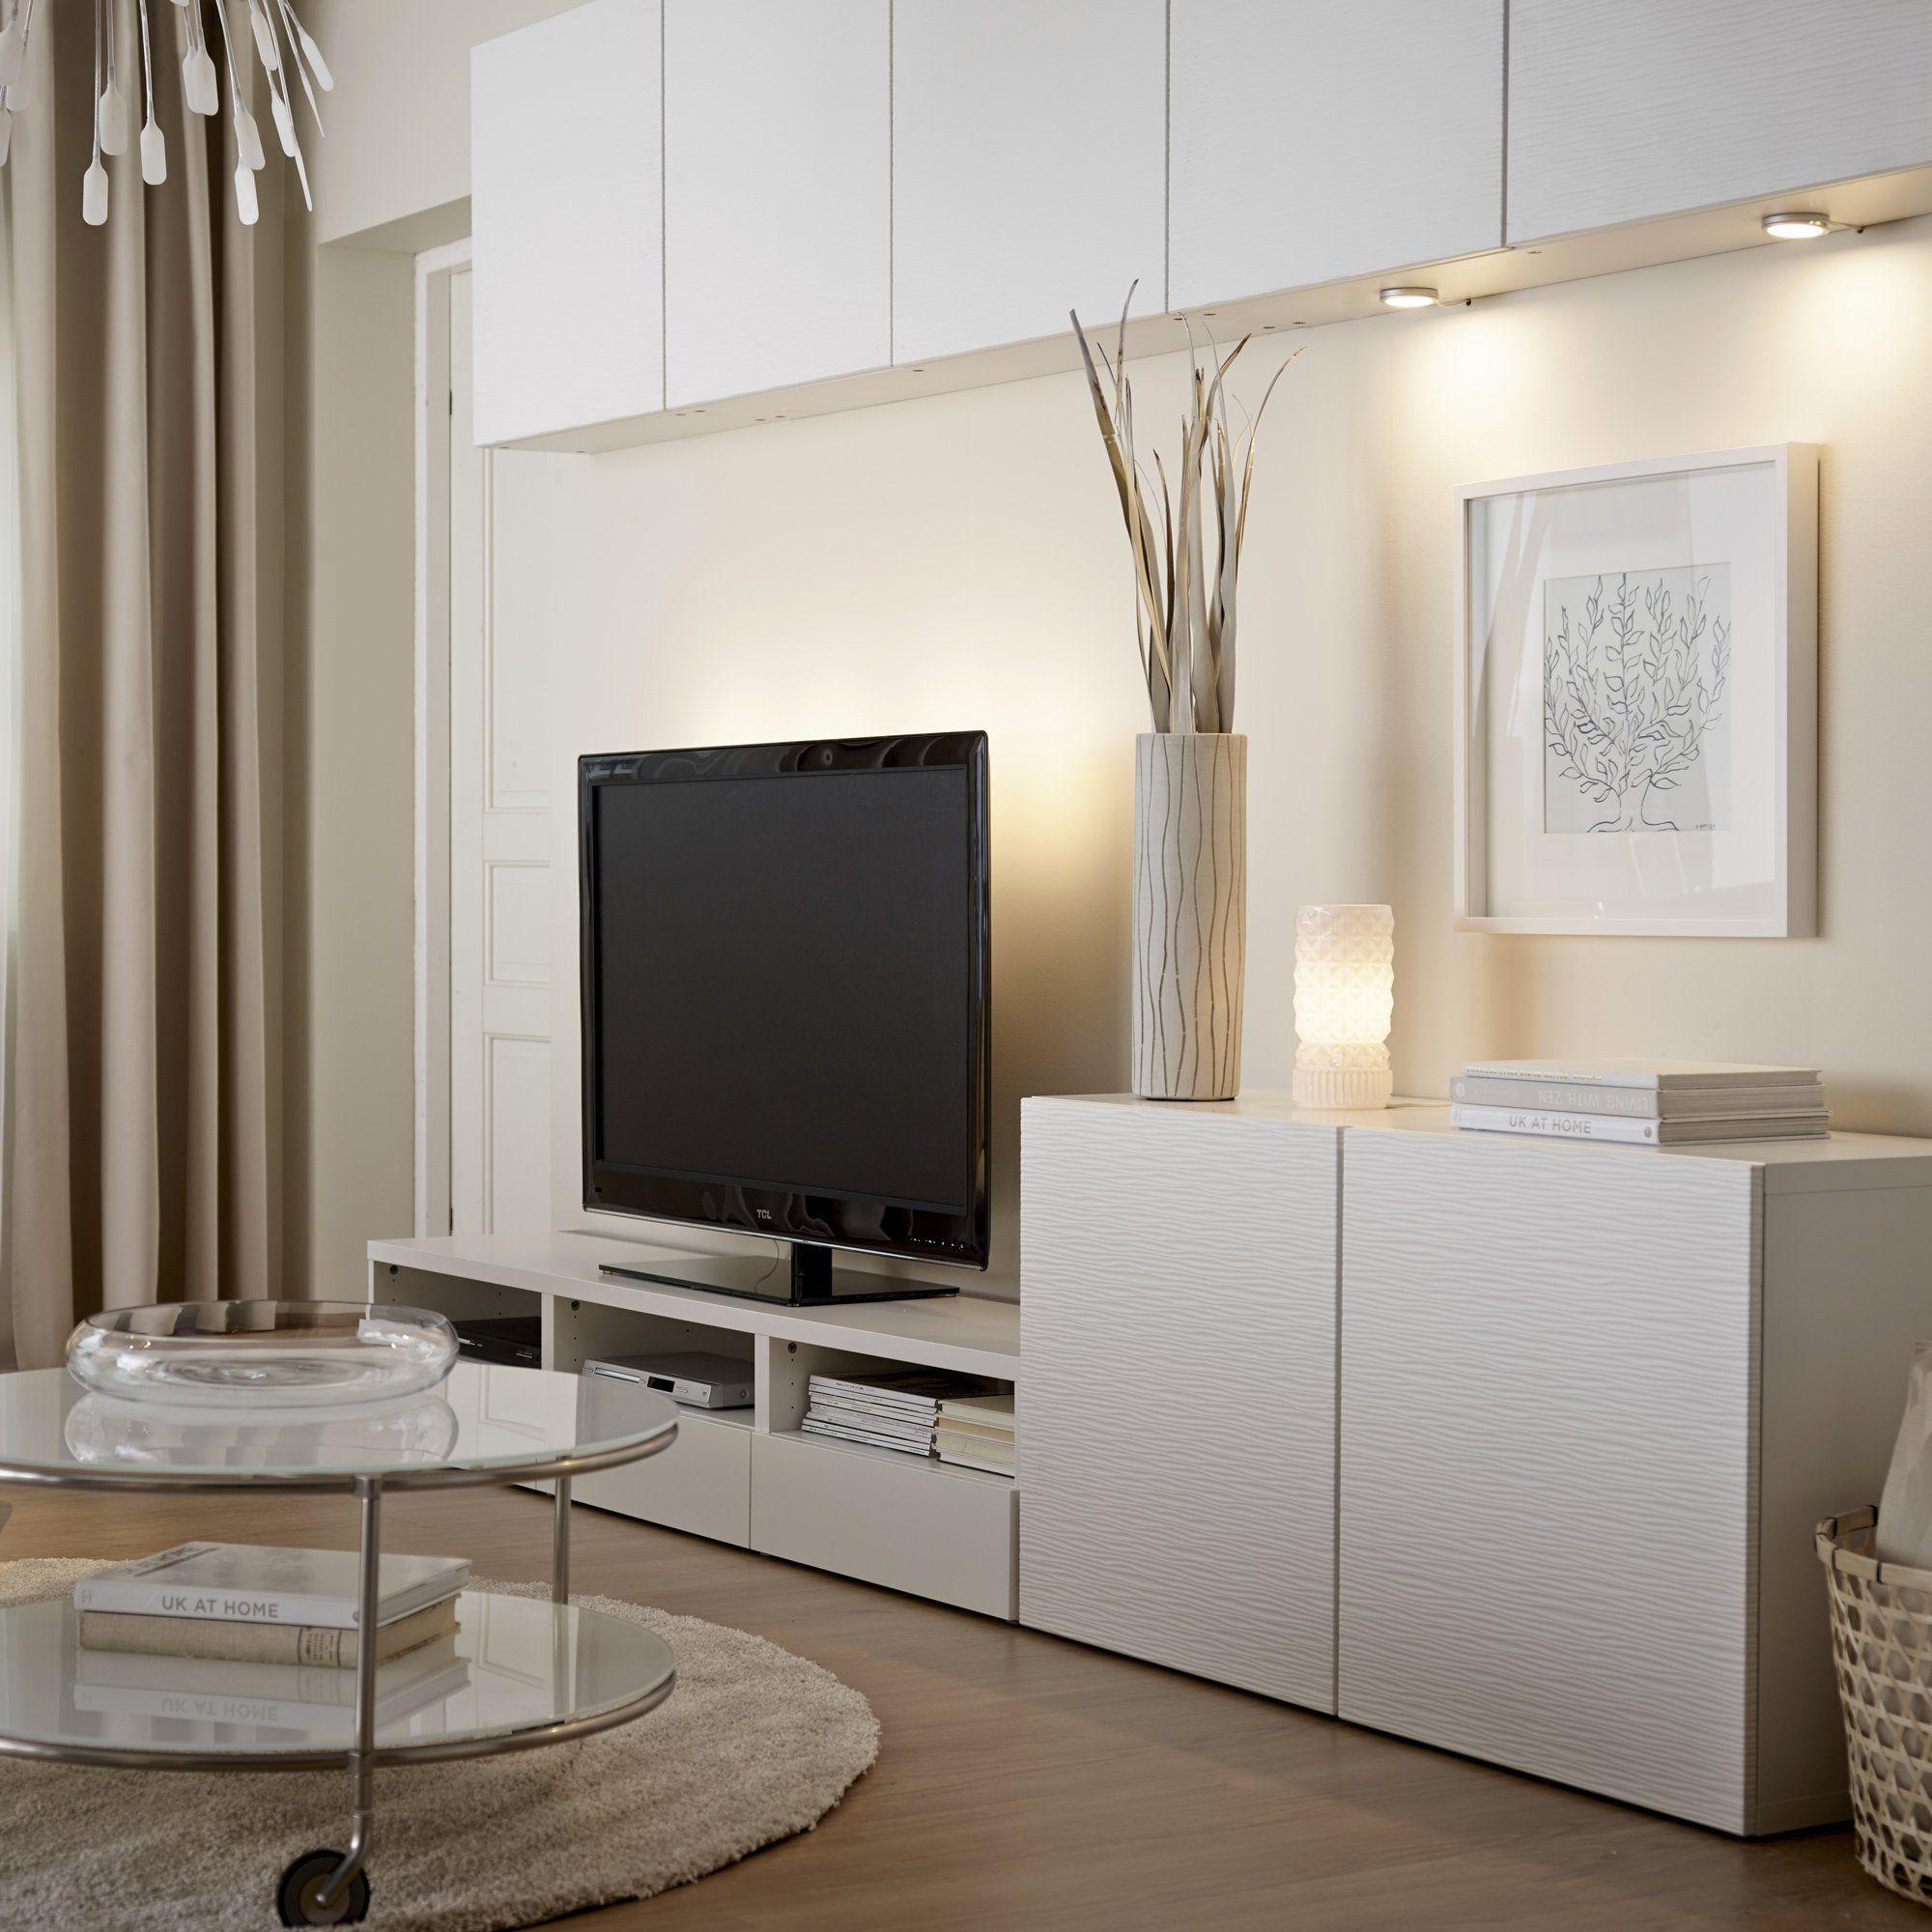 Meuble TV avec rangements, IKEA   Meuble tv rangement, Mobilier de ...